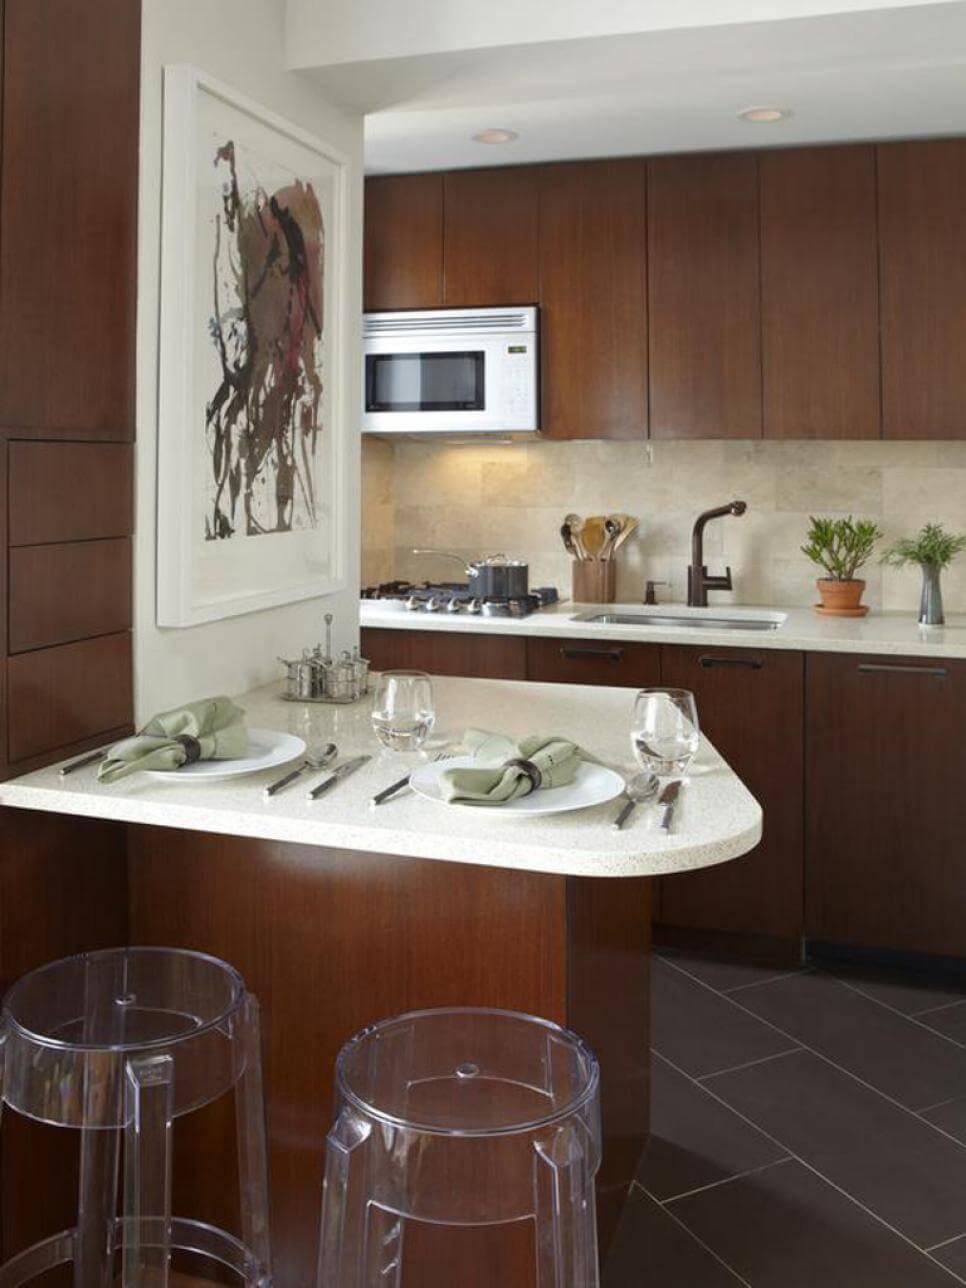 Creative design of the kitchen island seating furniture